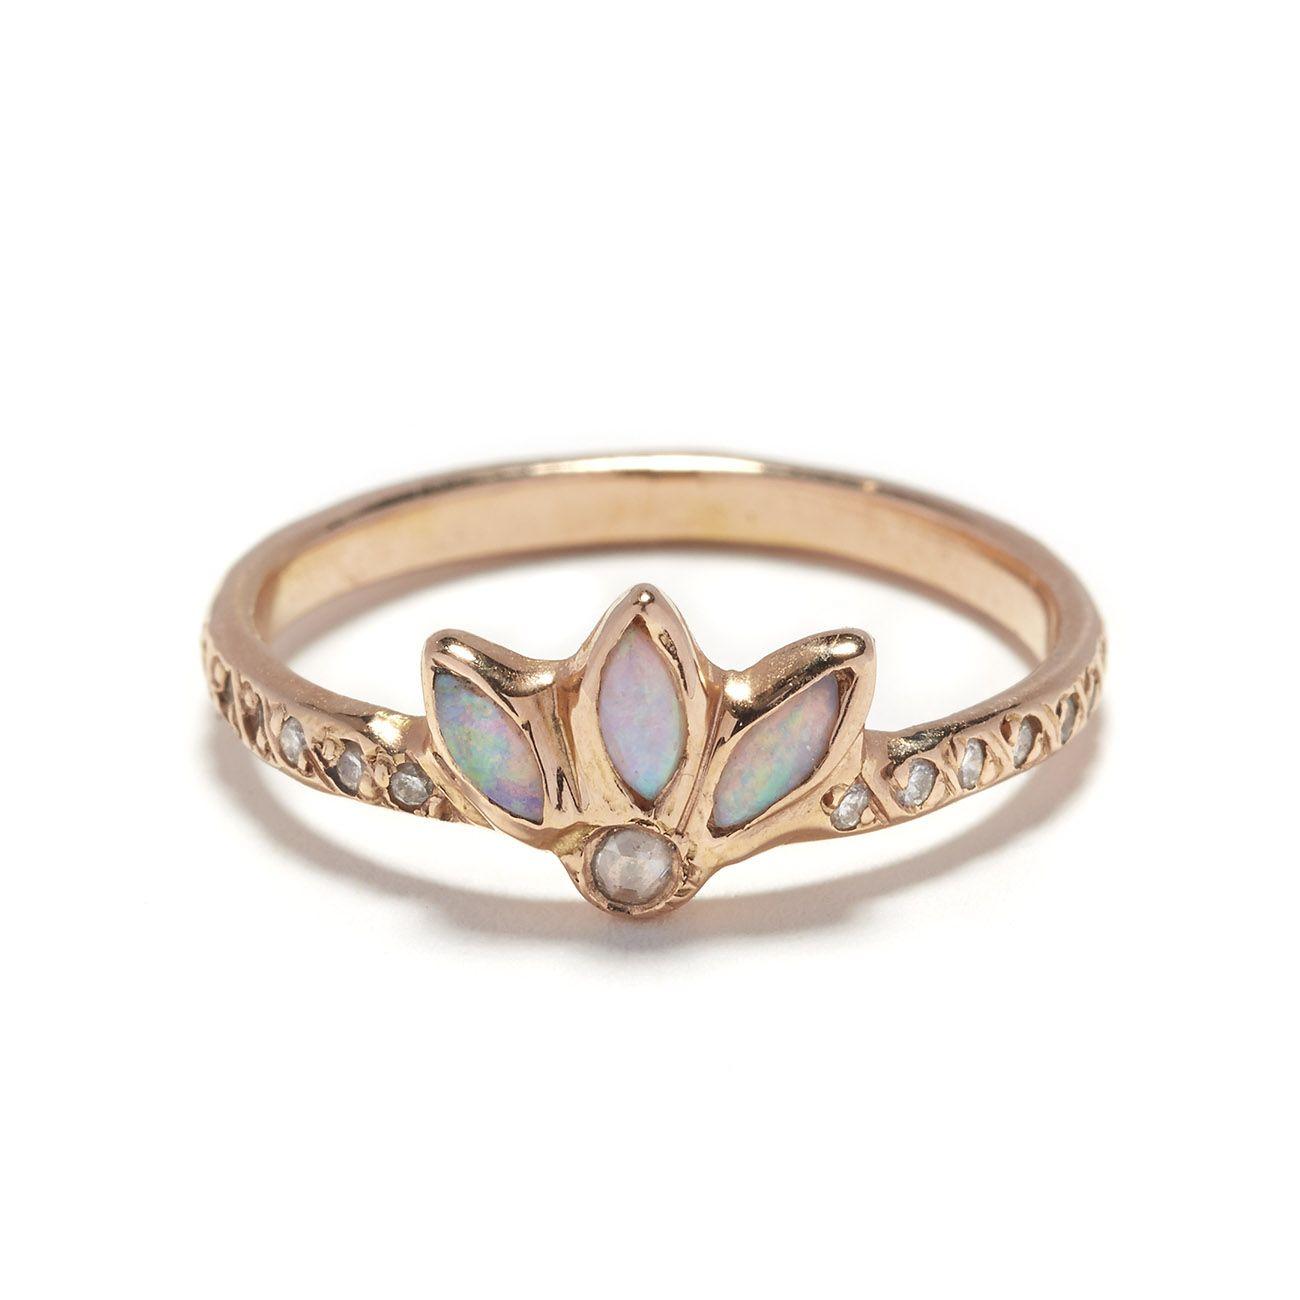 Elisa Solomon Jewelry 18 Karat Pink Gold Magic Flower Ring With Opal